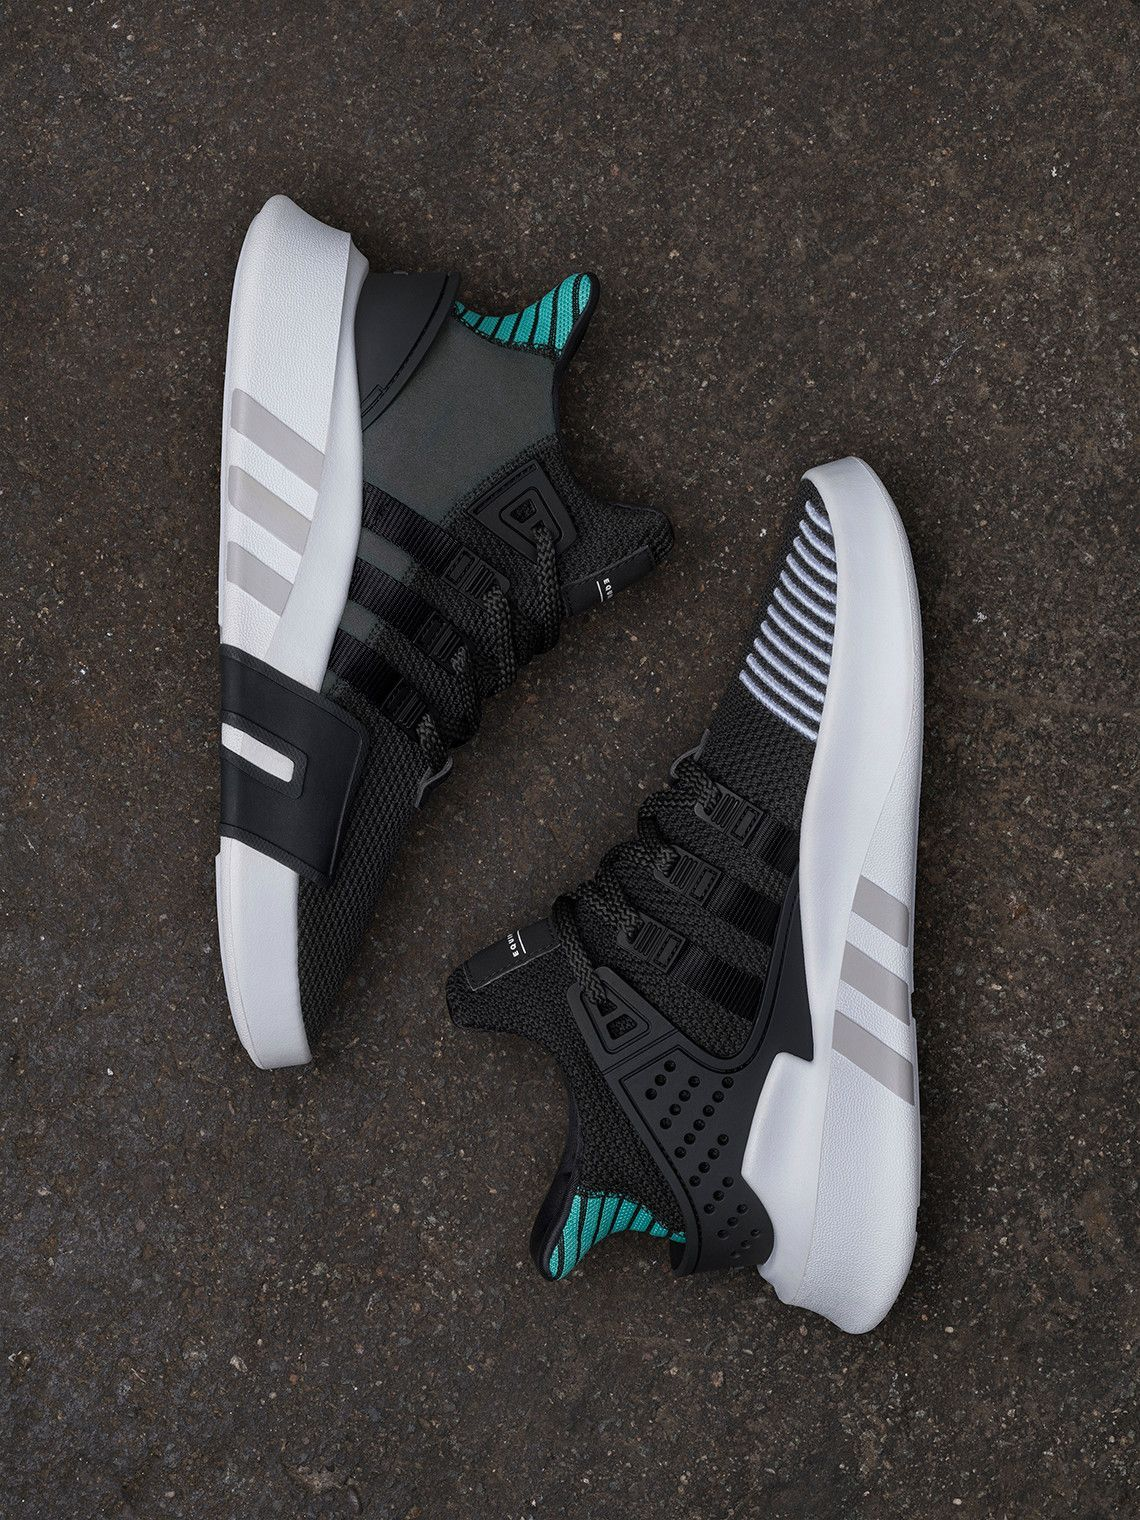 sneakernewscom #release #adidas #racing #bask #info #eqt ...